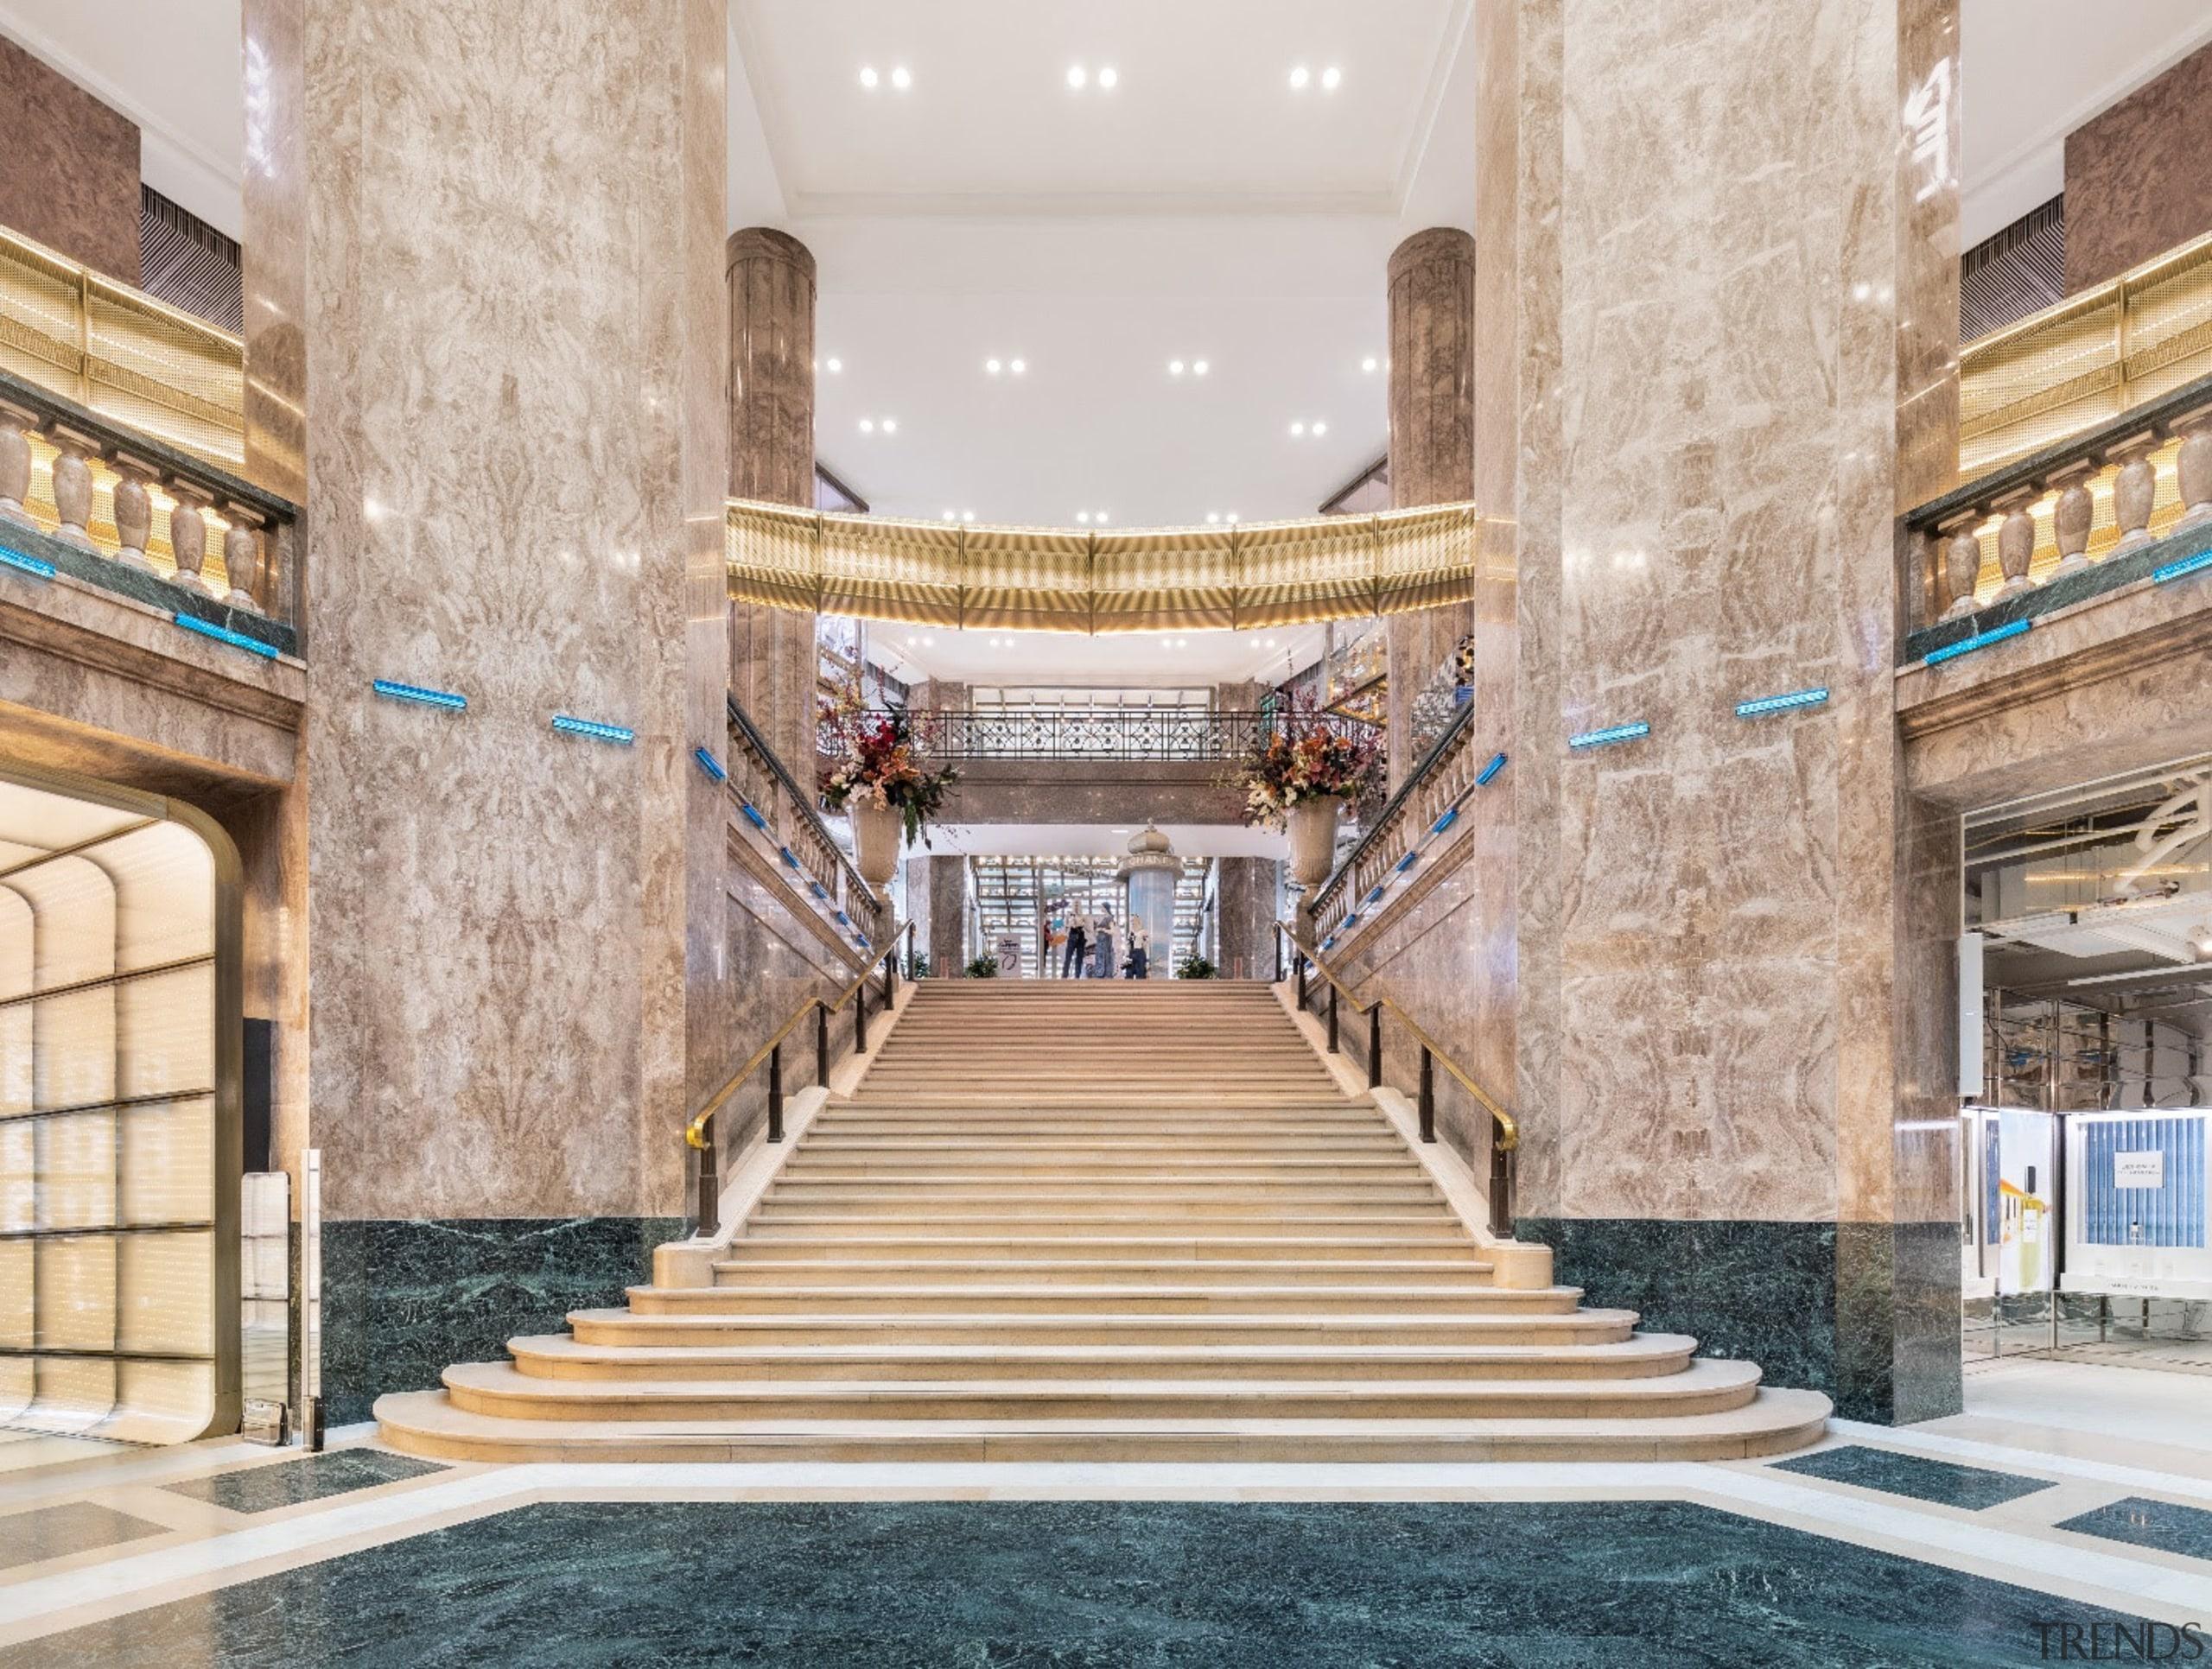 Photo by Delfino Sisto Legnani and Marco Cappelletti architecture, building, column, floor, interior design, lobby, room, stairs, gray